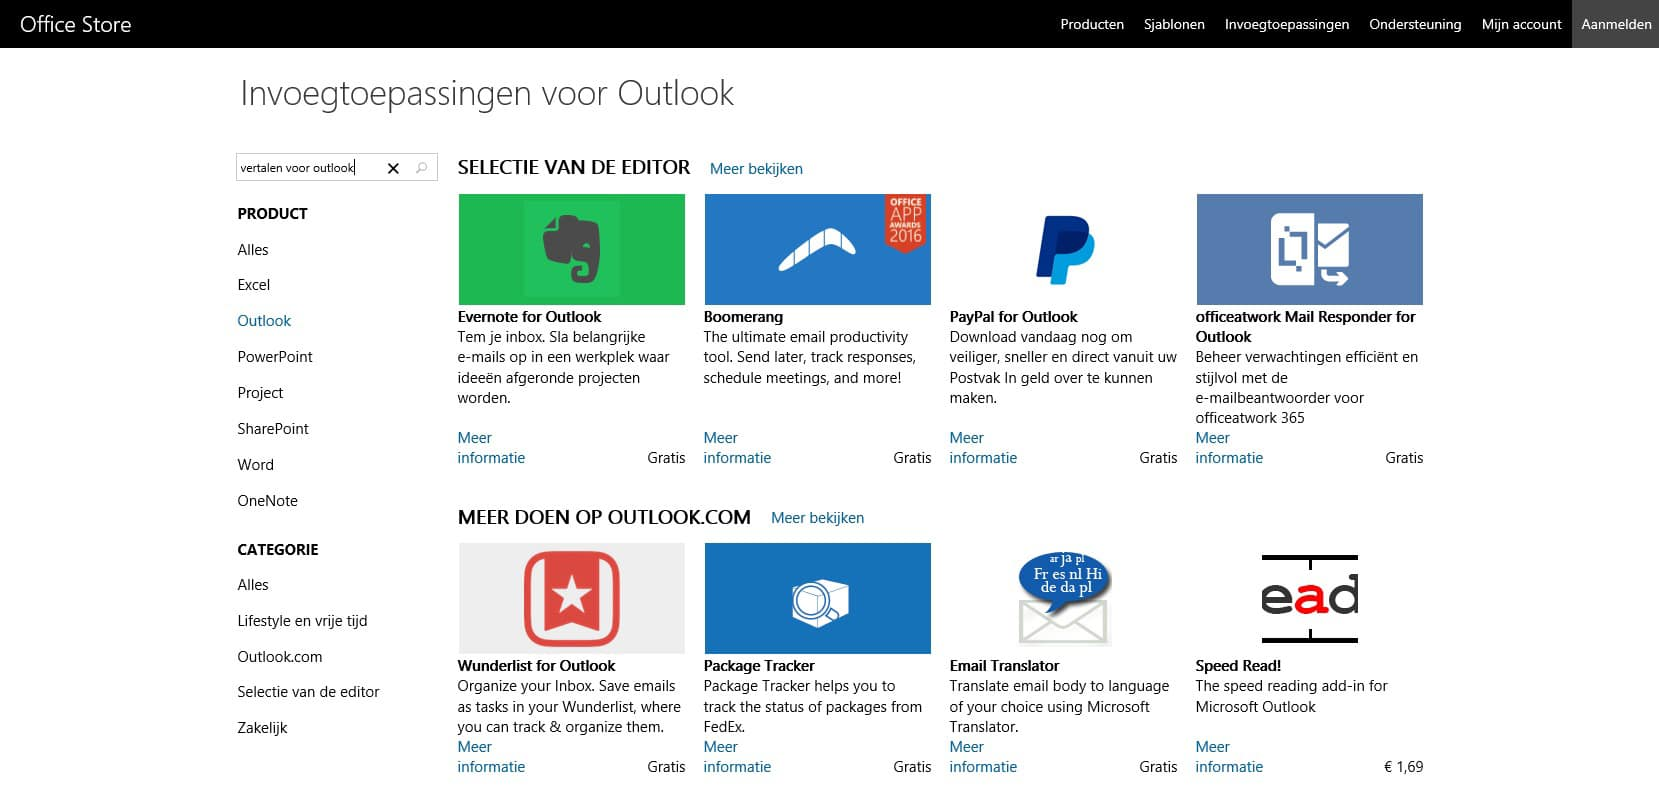 Translator for Outlook - Zoeken in Office Store